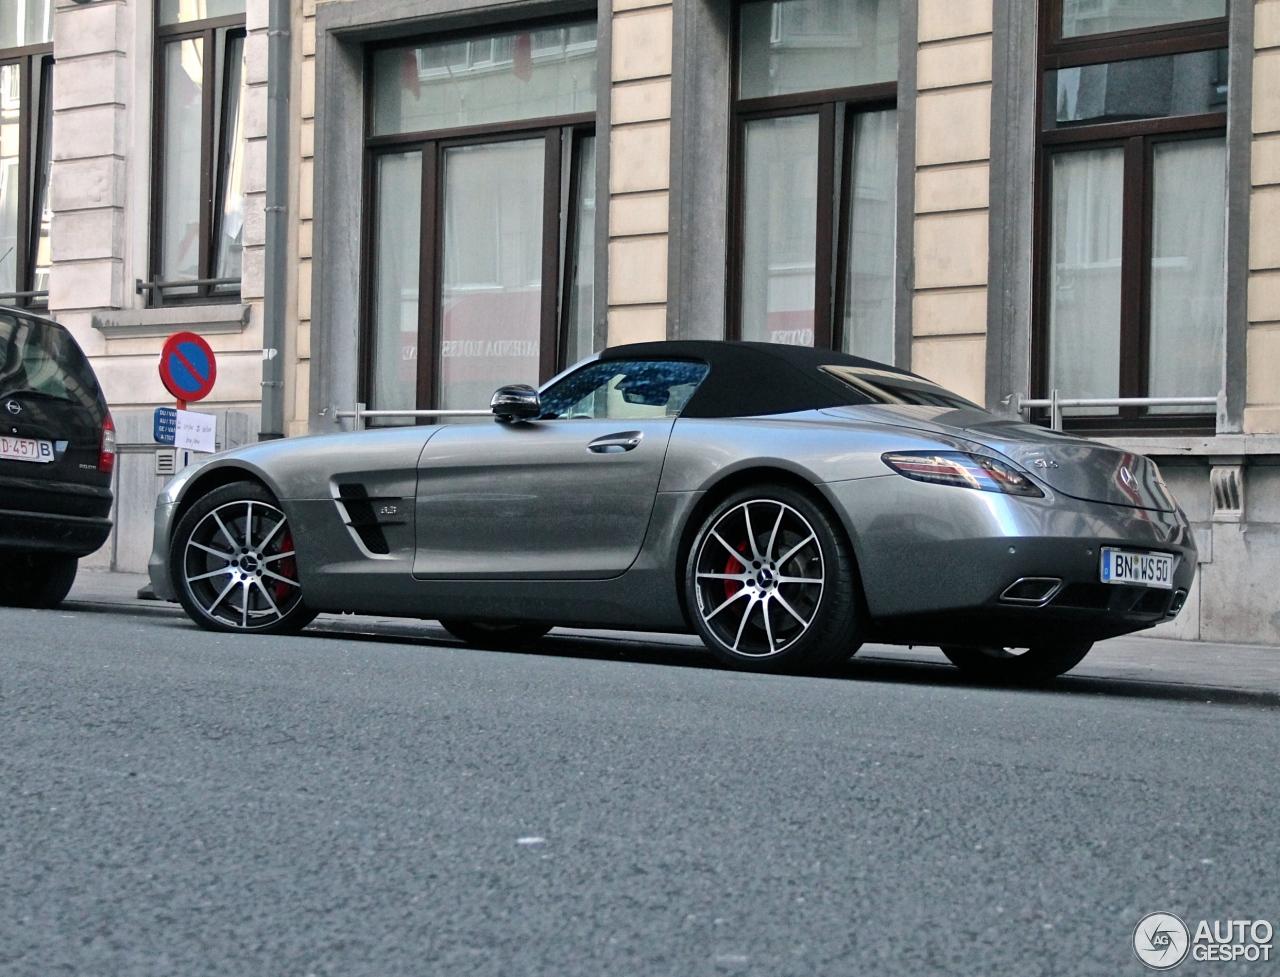 Mercedes benz sls amg gt roadster 20 june 2014 autogespot for 2014 mercedes benz sls amg price